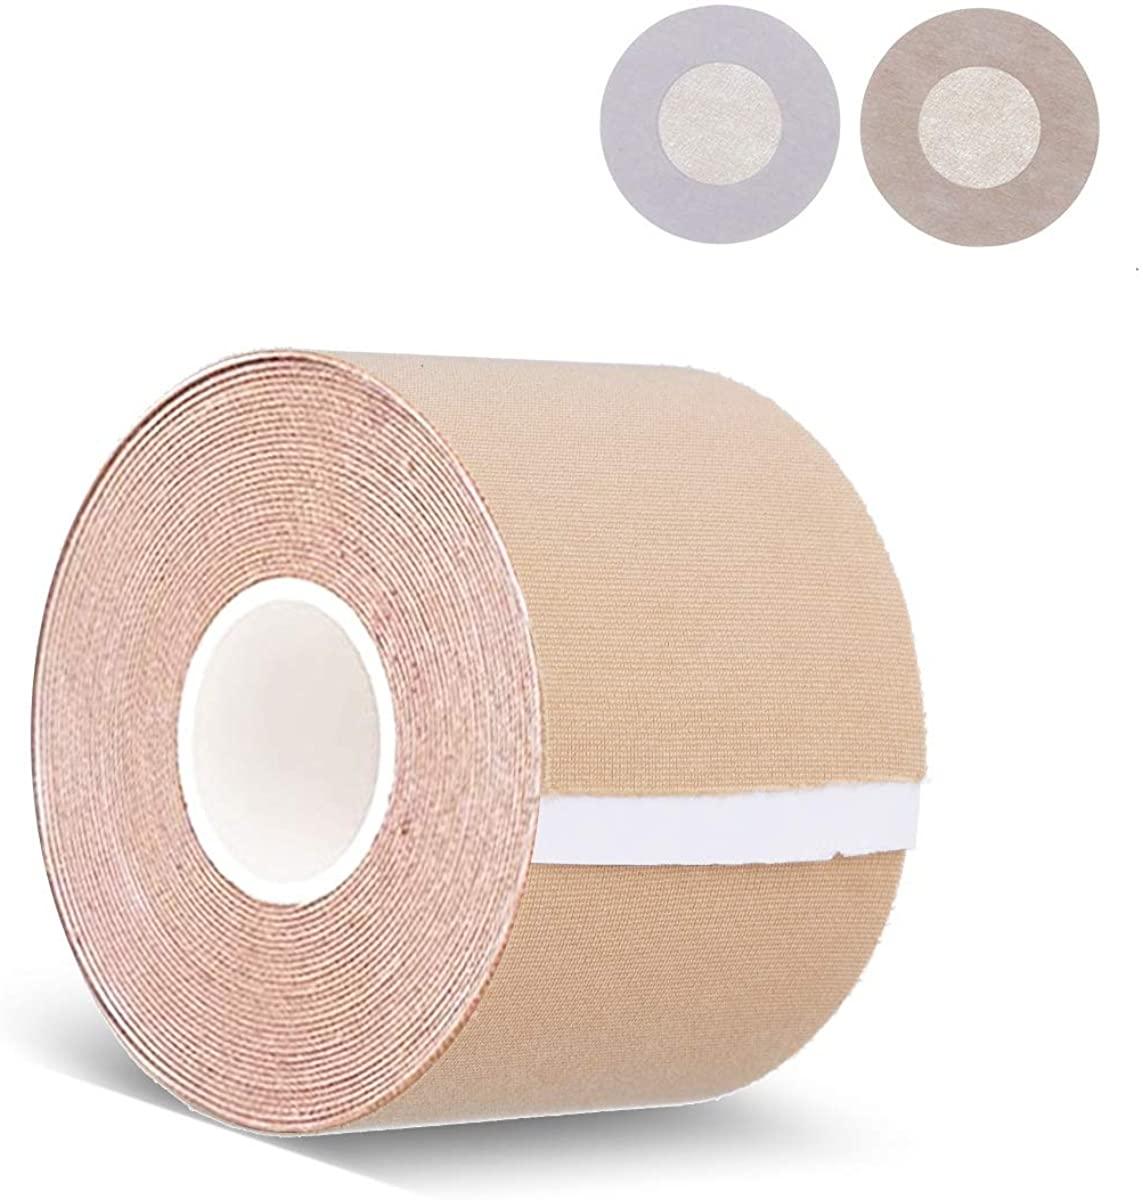 Breast Lift Tape,Bob Tape and 10 Pcs Nipple Covers Set Medical Grade Athletic Tape Adhesive Bra Boob Tape